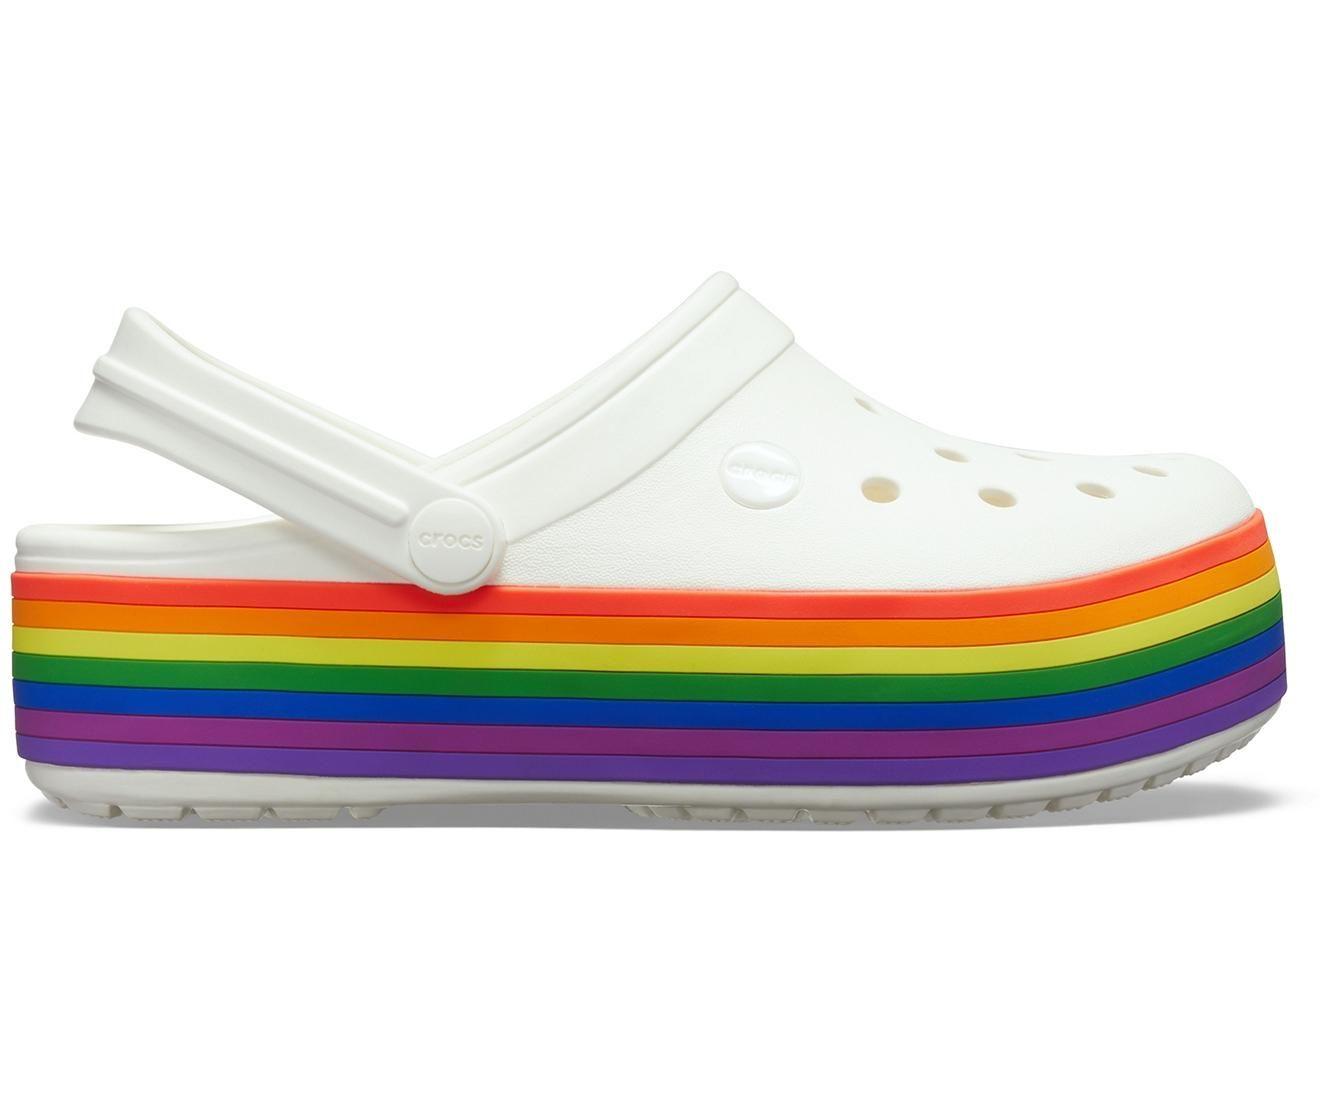 t h e rainbow platform crocs in 2020